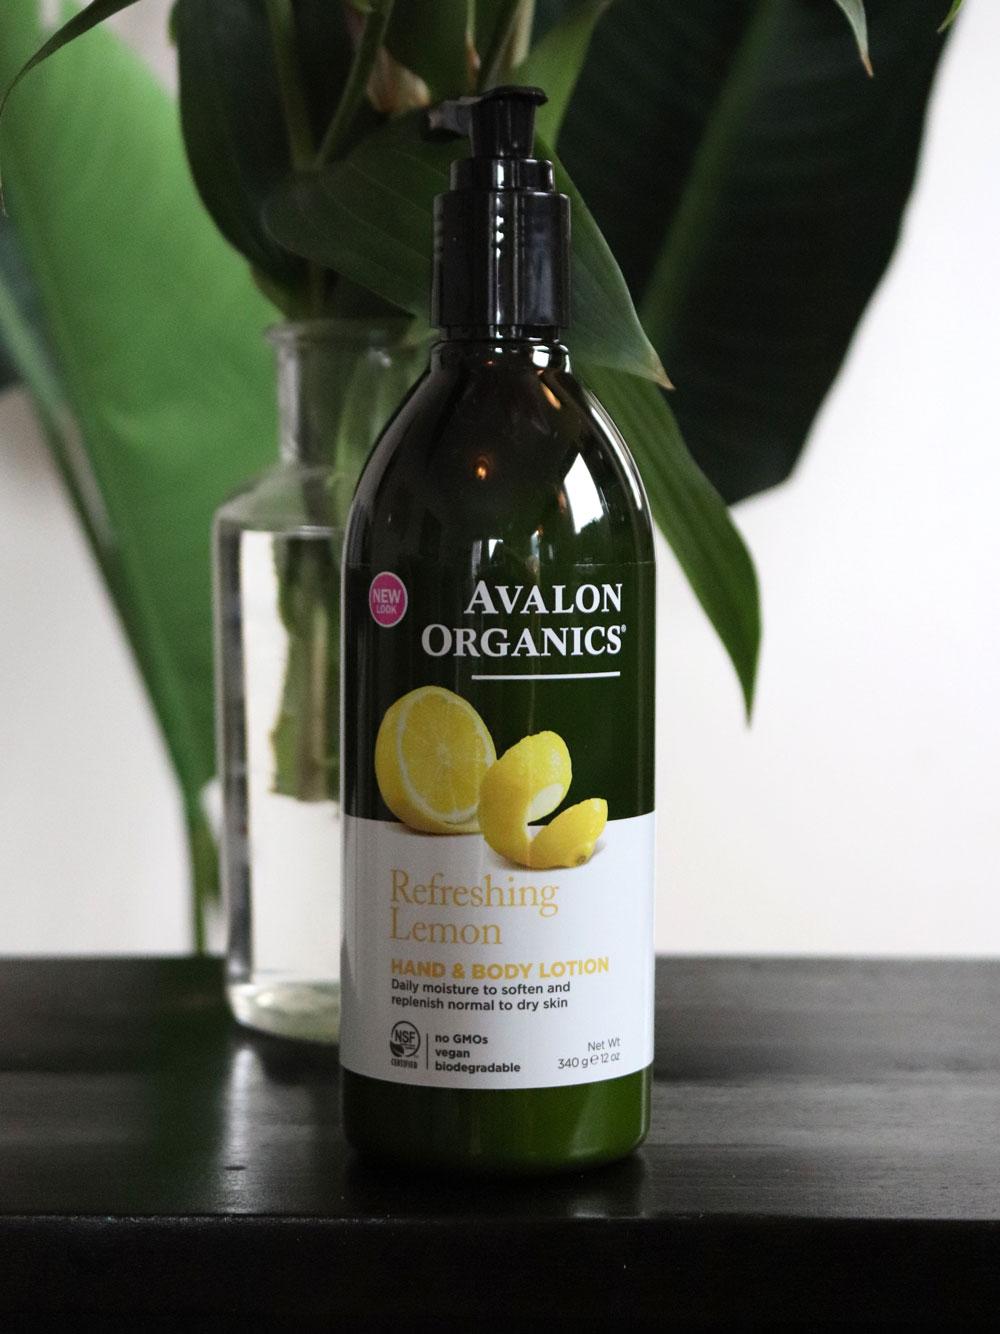 Avalon Organics Hand & Body Lotion at iHerb